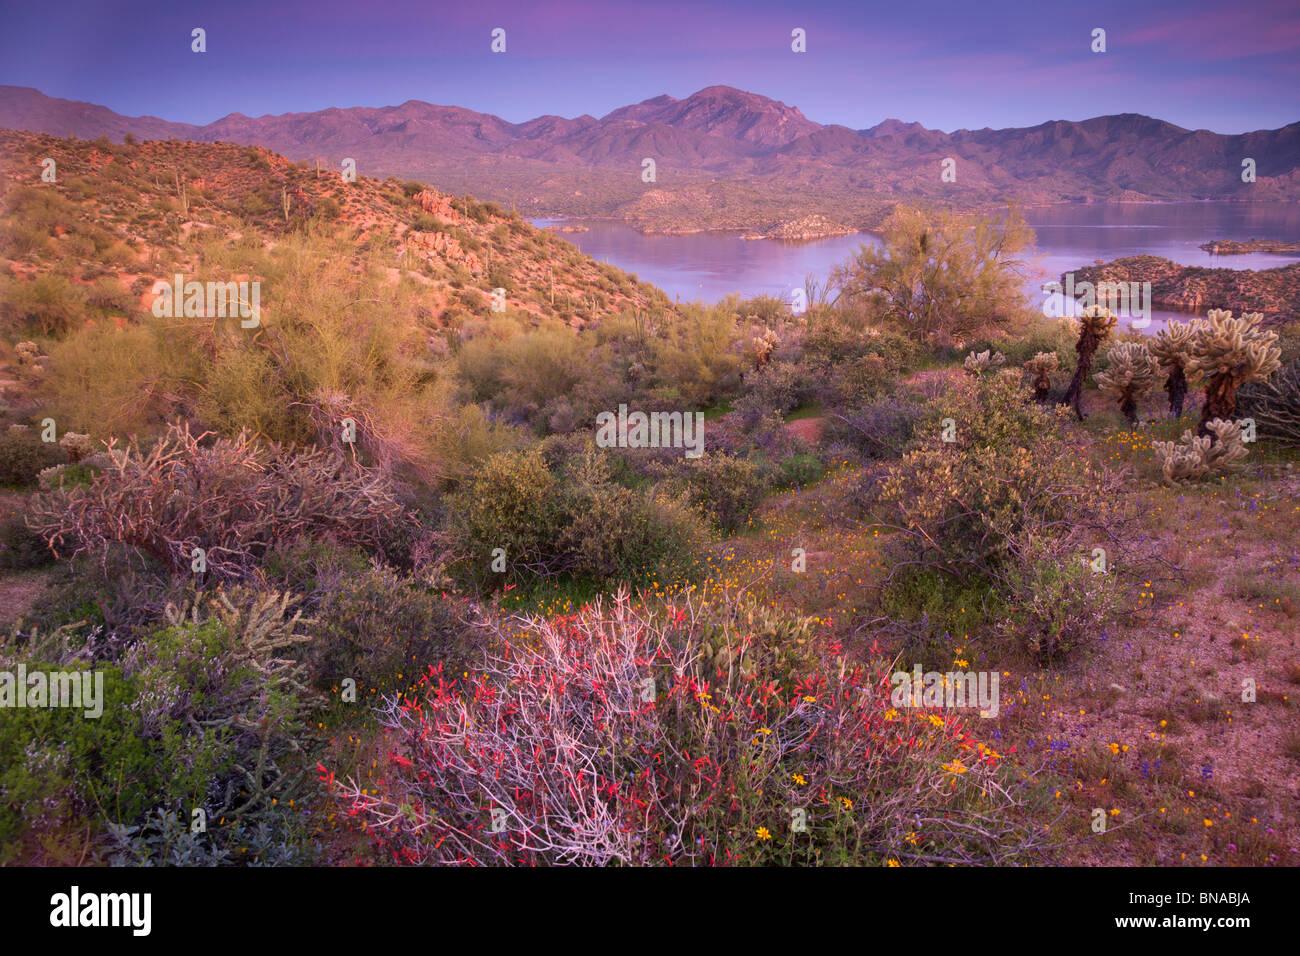 Flores silvestres a lo largo de lago Bartlett, el Bosque Nacional de Tonto, cerca de Phoenix, Arizona. Imagen De Stock